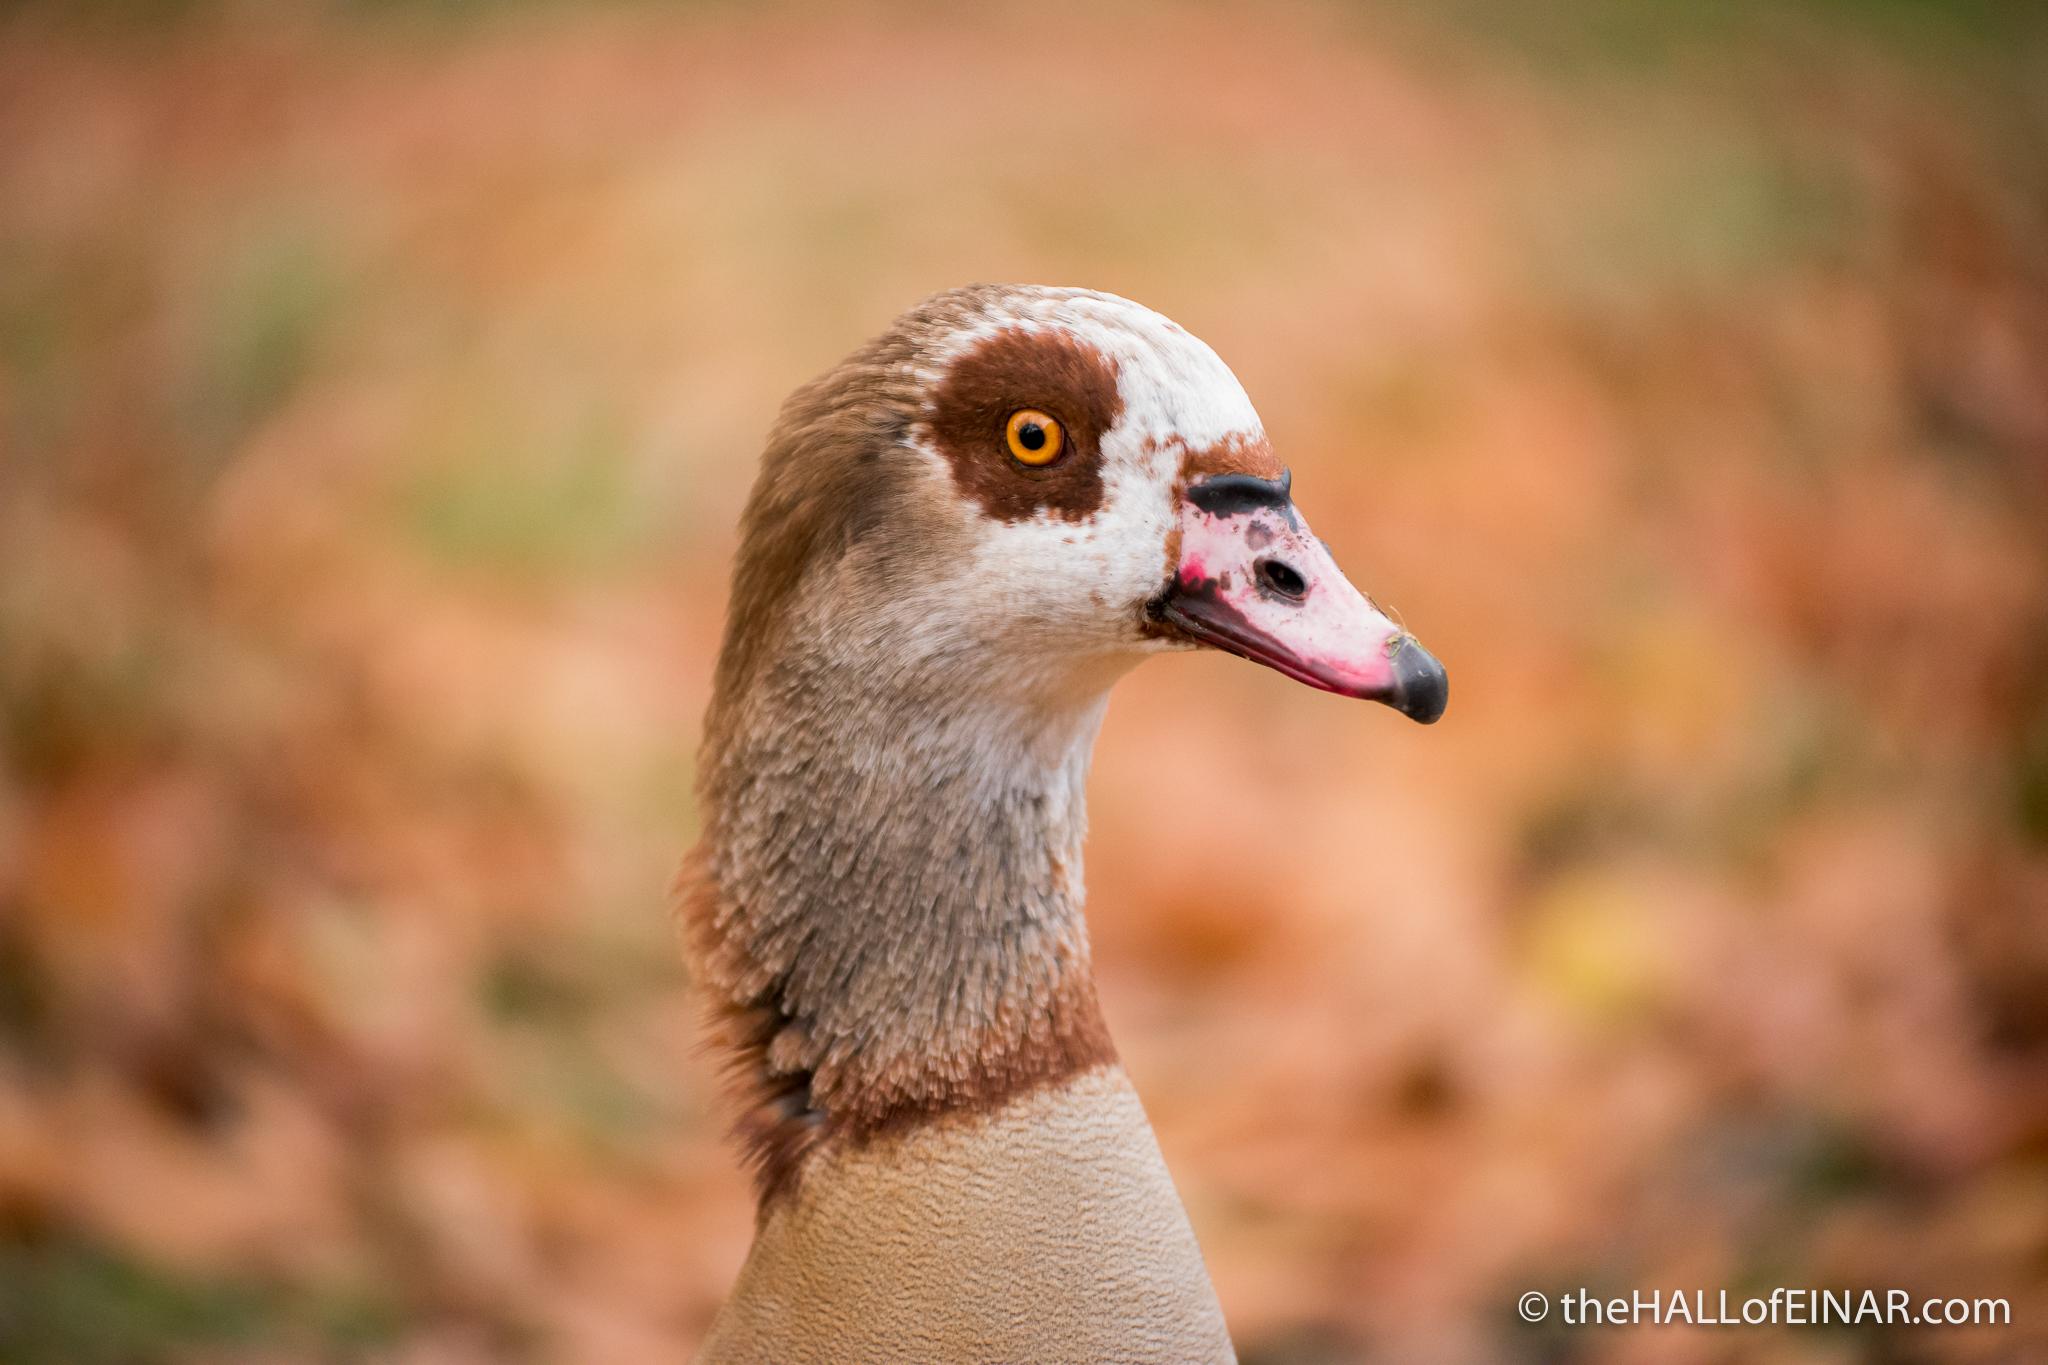 Egyptian Goose - The Hall of Einar - photograph (c) David Bailey (not the)